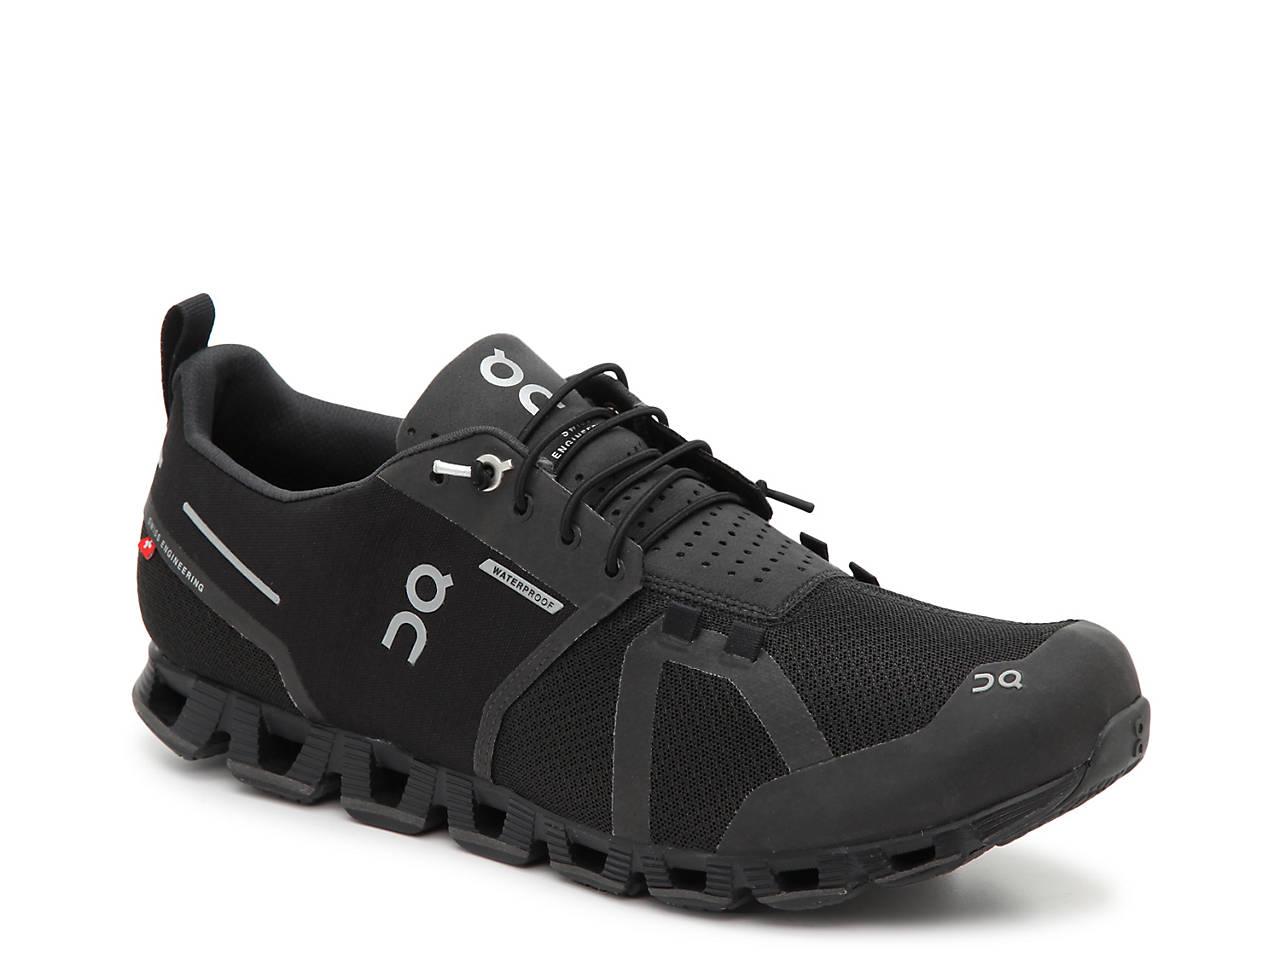 9681fe6dc On Cloud 2.0 Waterproof Running Shoe - Men's Men's Shoes | DSW